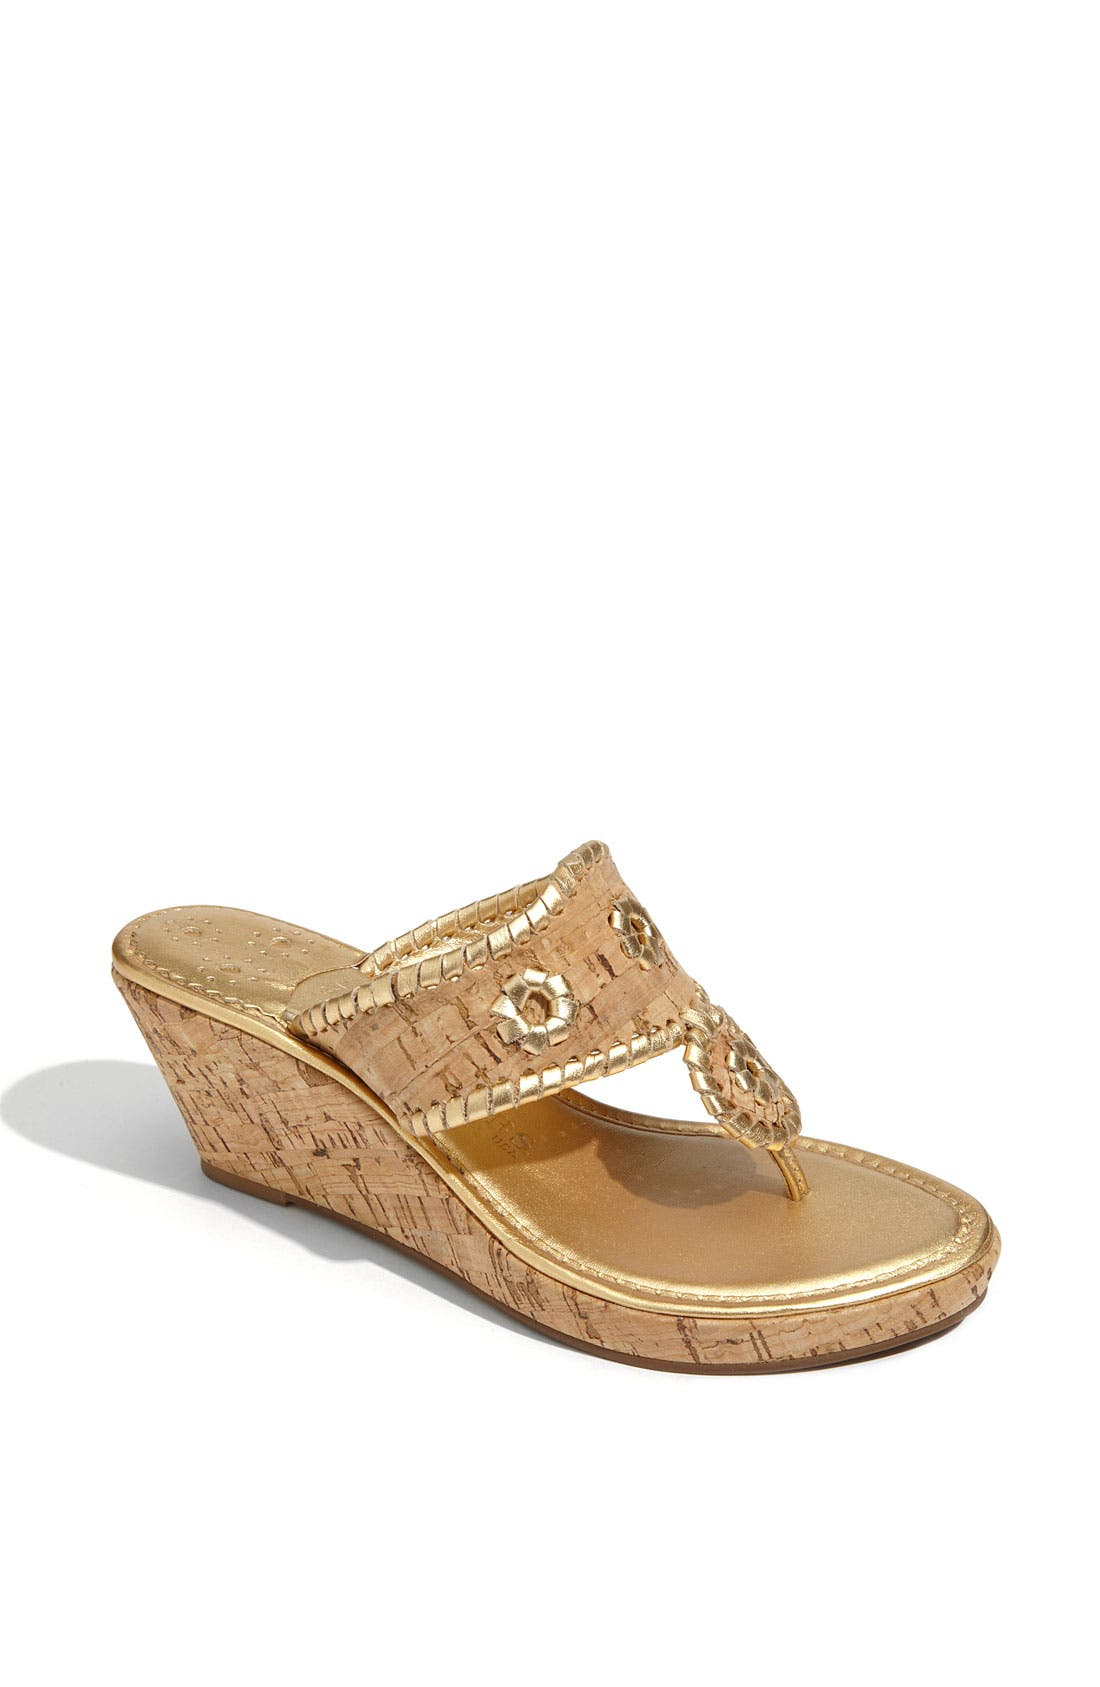 Alternate Image 1 Selected - Jack Rogers 'Marbella' Cork Sandal